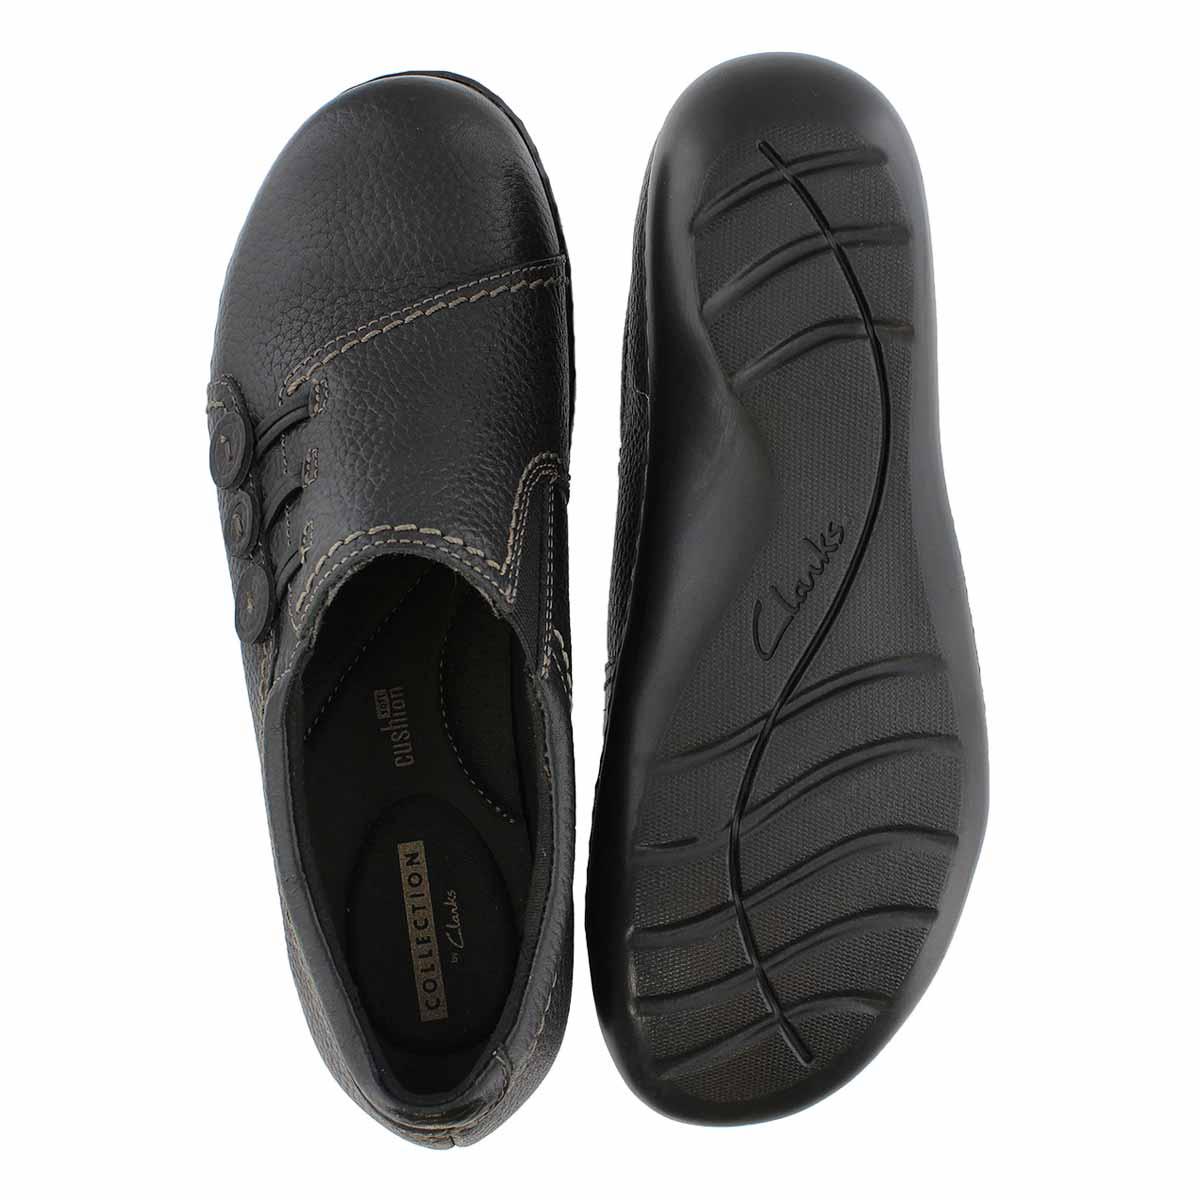 Lds Ashland Effie black casual slip on